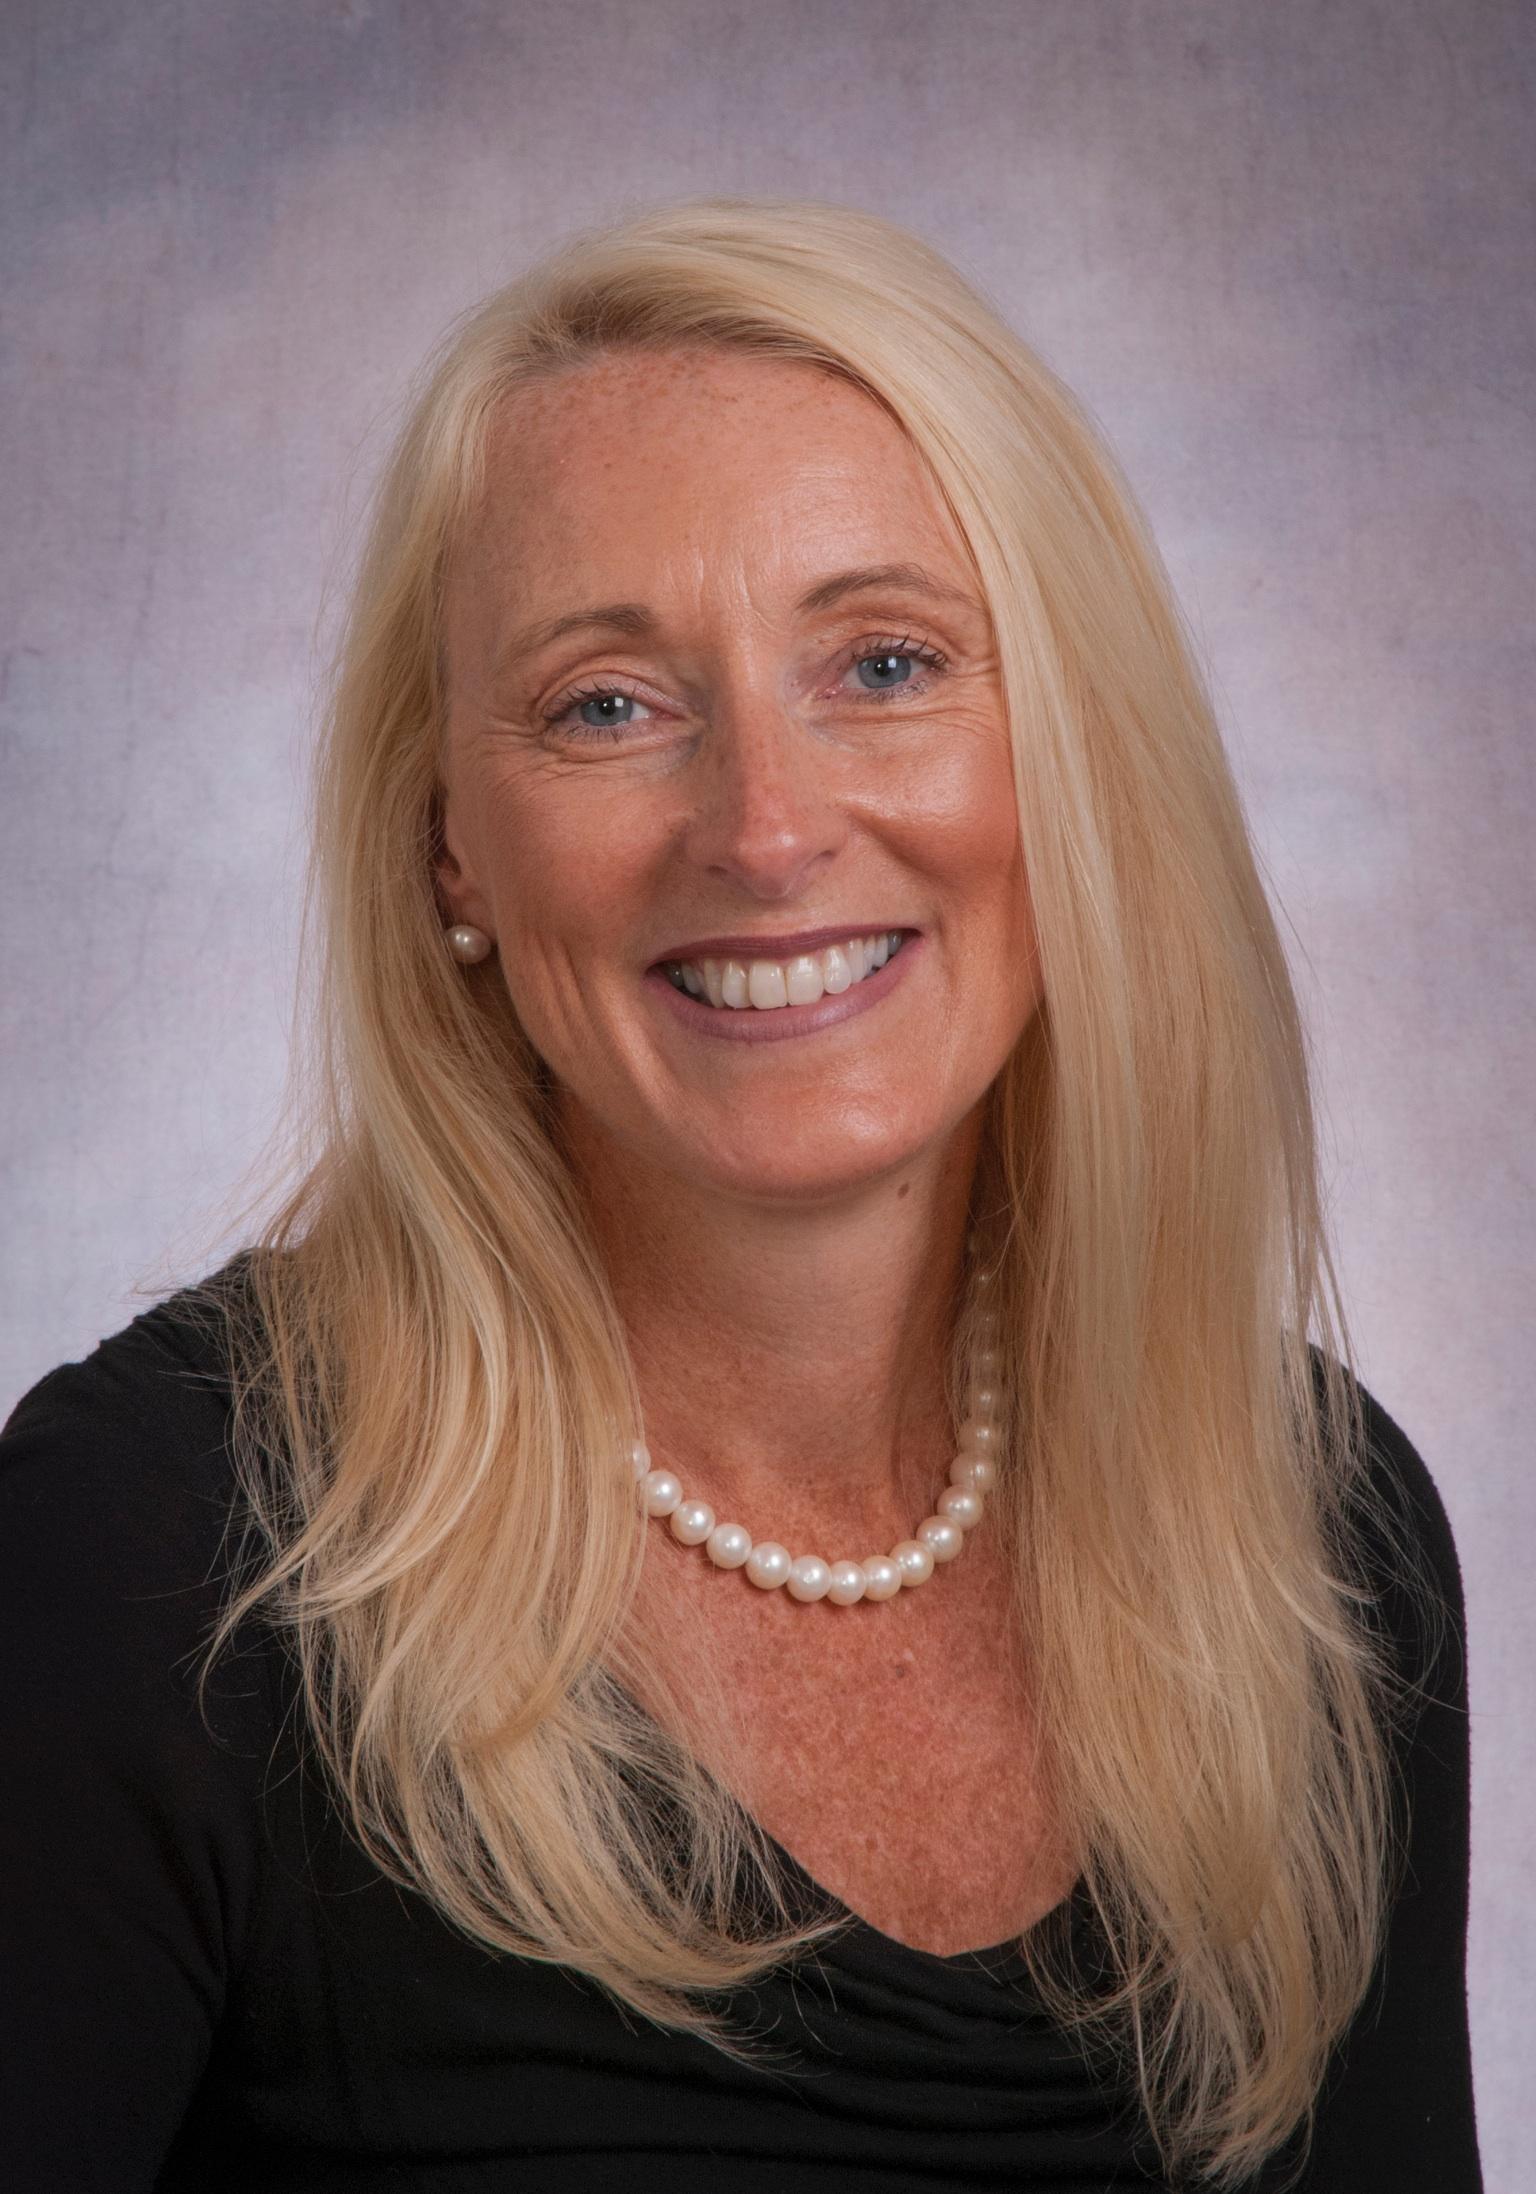 Dr. Adelle Atkinson